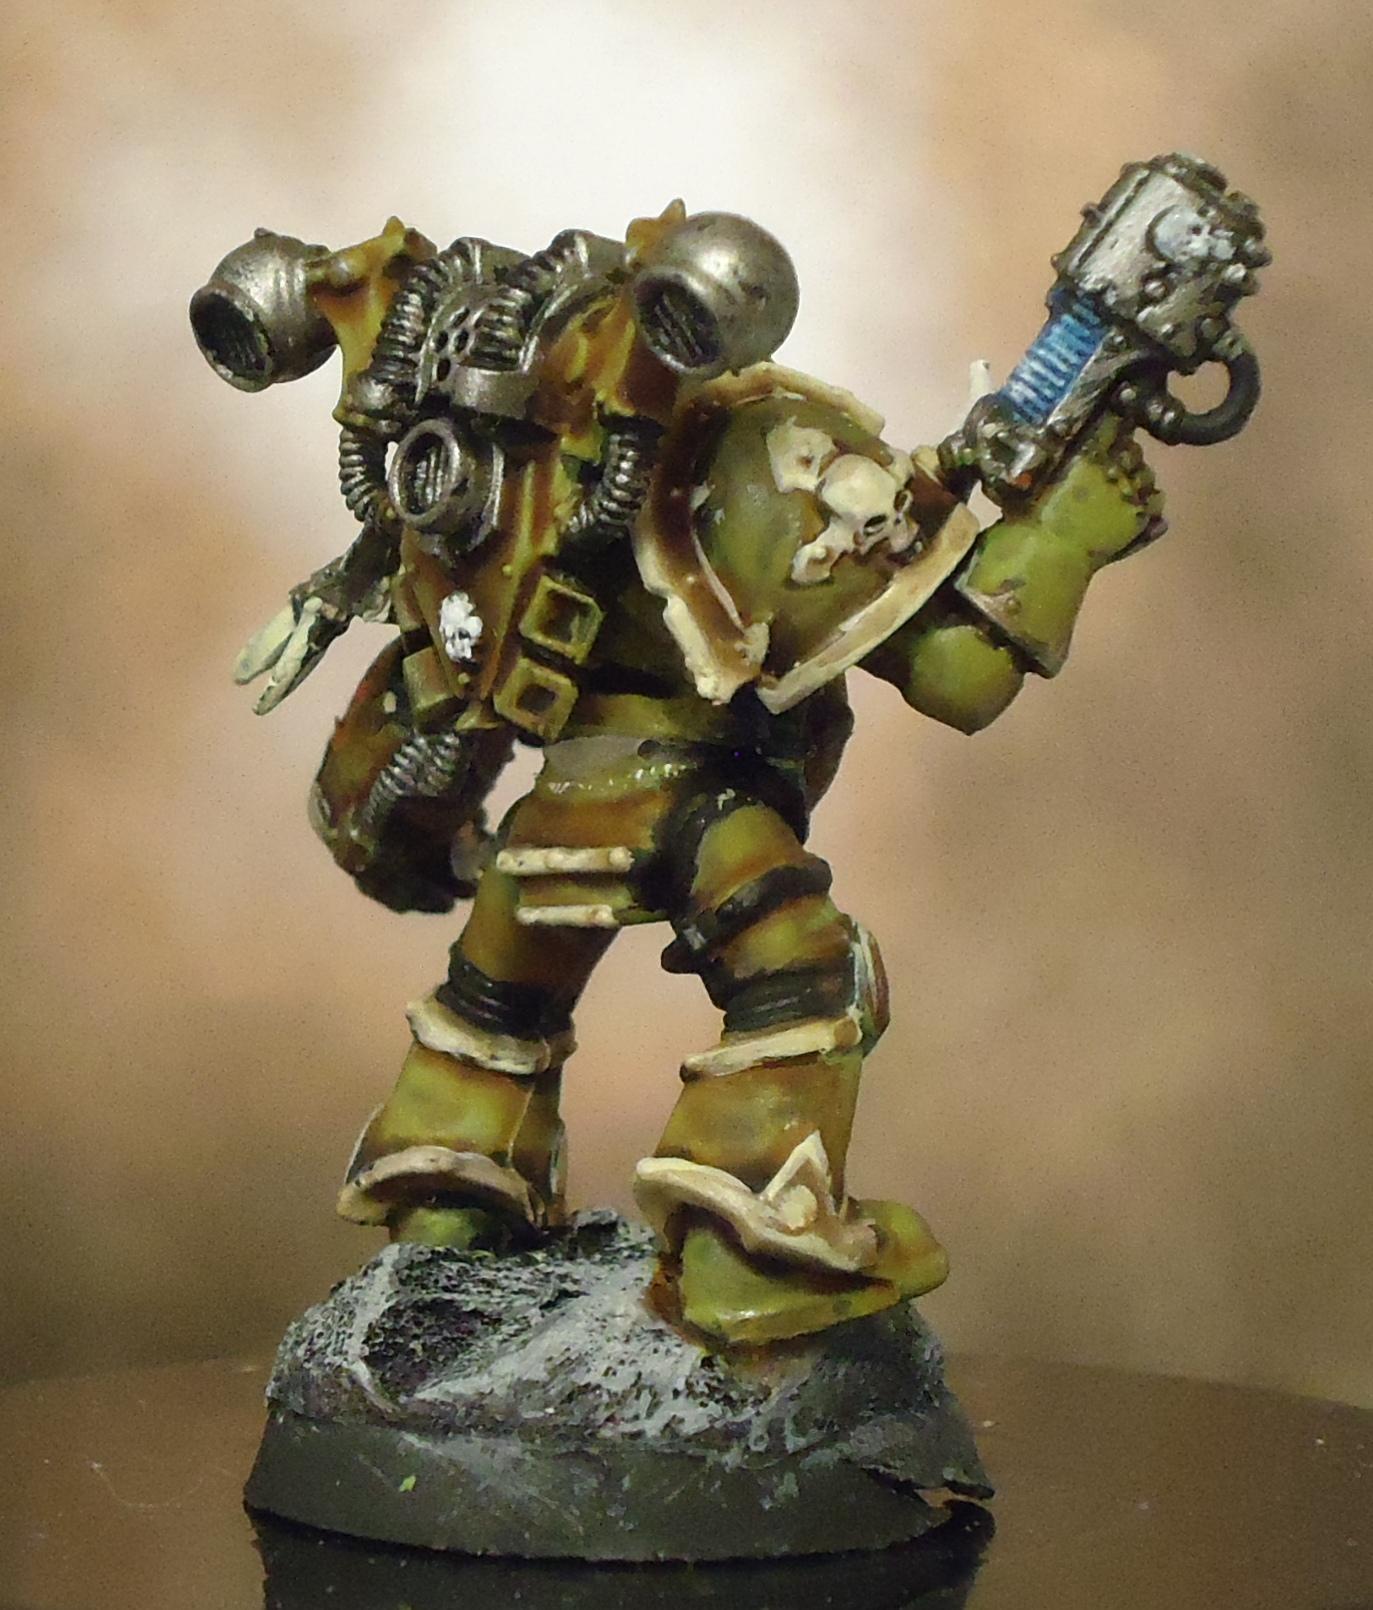 Chaos Space Marines, Death Guard, Decay, Nurgle, Plague Marines, Plasma Pistol, Rot